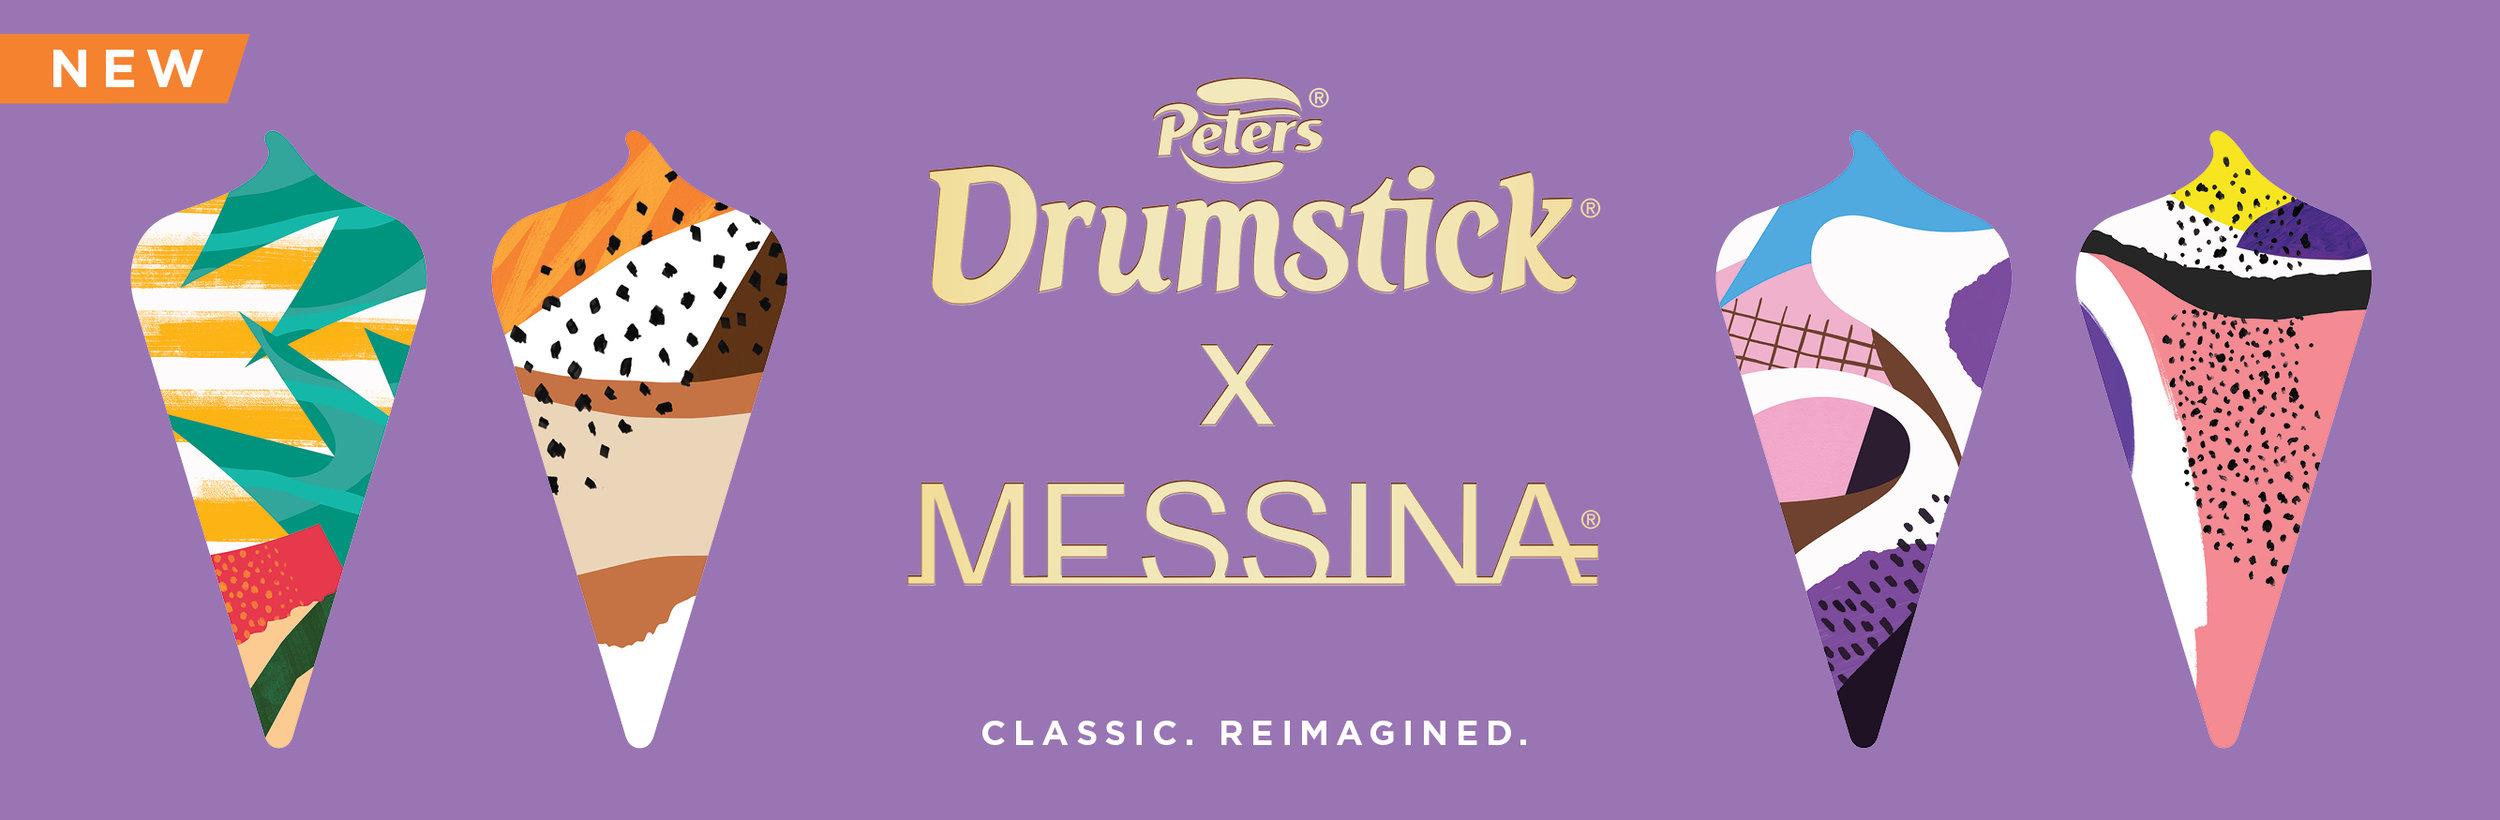 DrumstickXMessina_BannerImage_2667X875-1.jpg